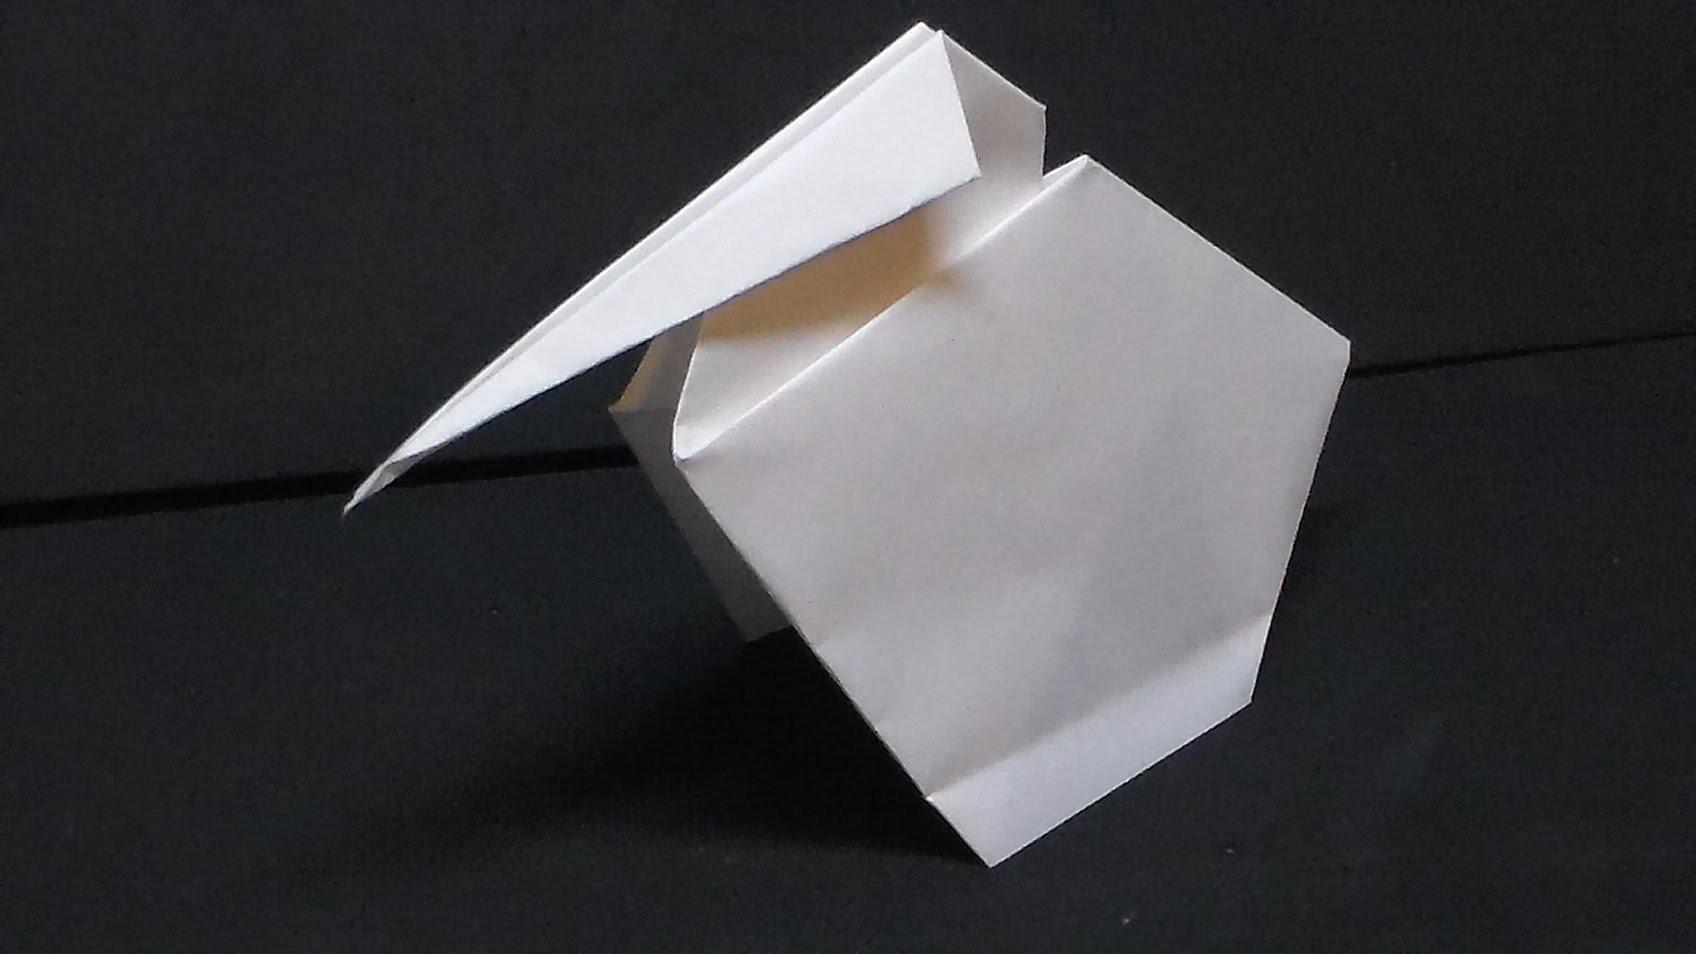 How to make an easy origami Kiwi